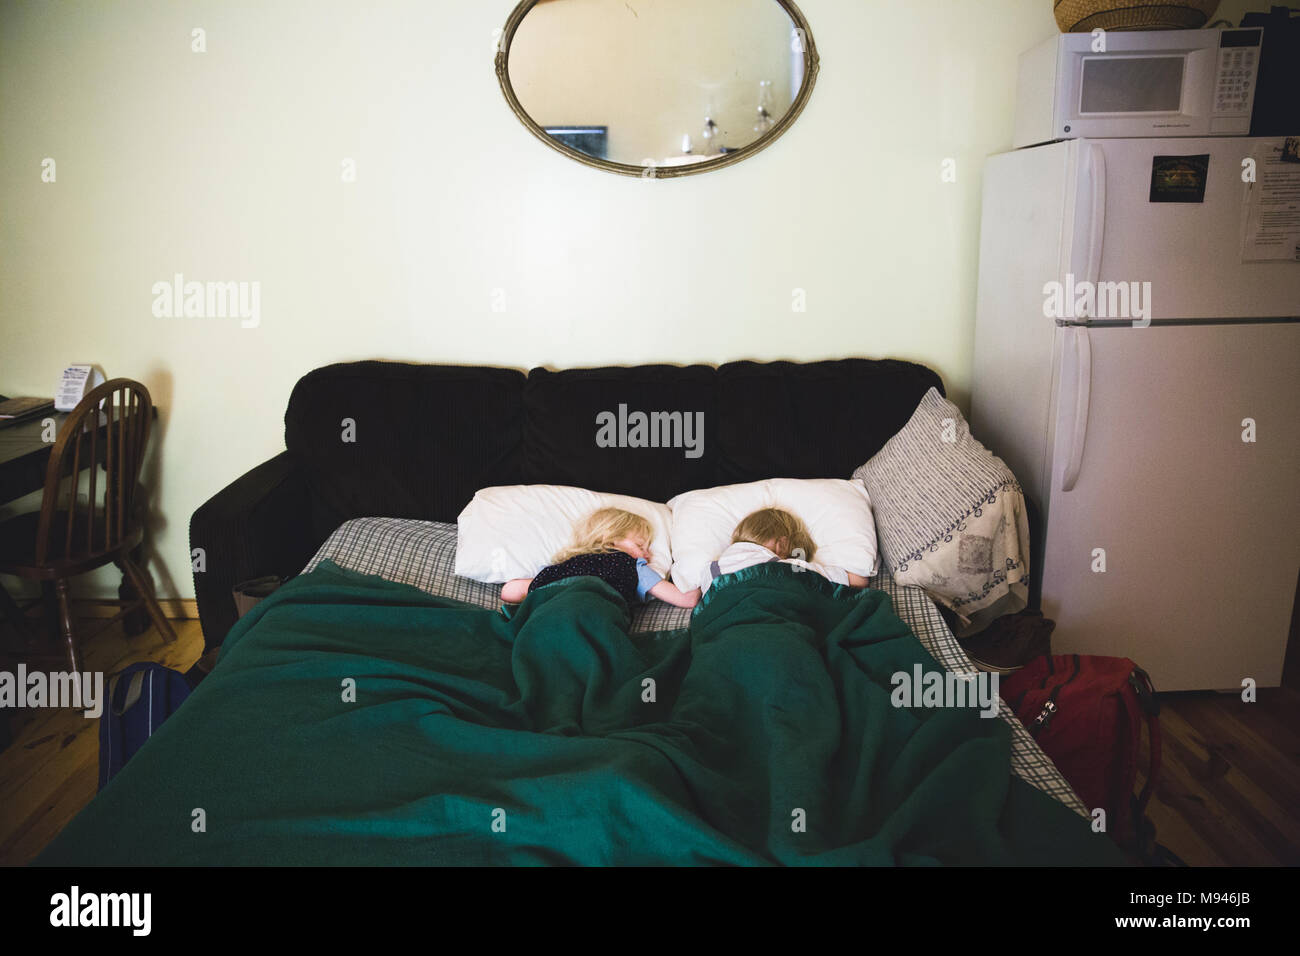 Divano Letto Per Bambino : Divano letto per bambino divano divano letto bambini stencil